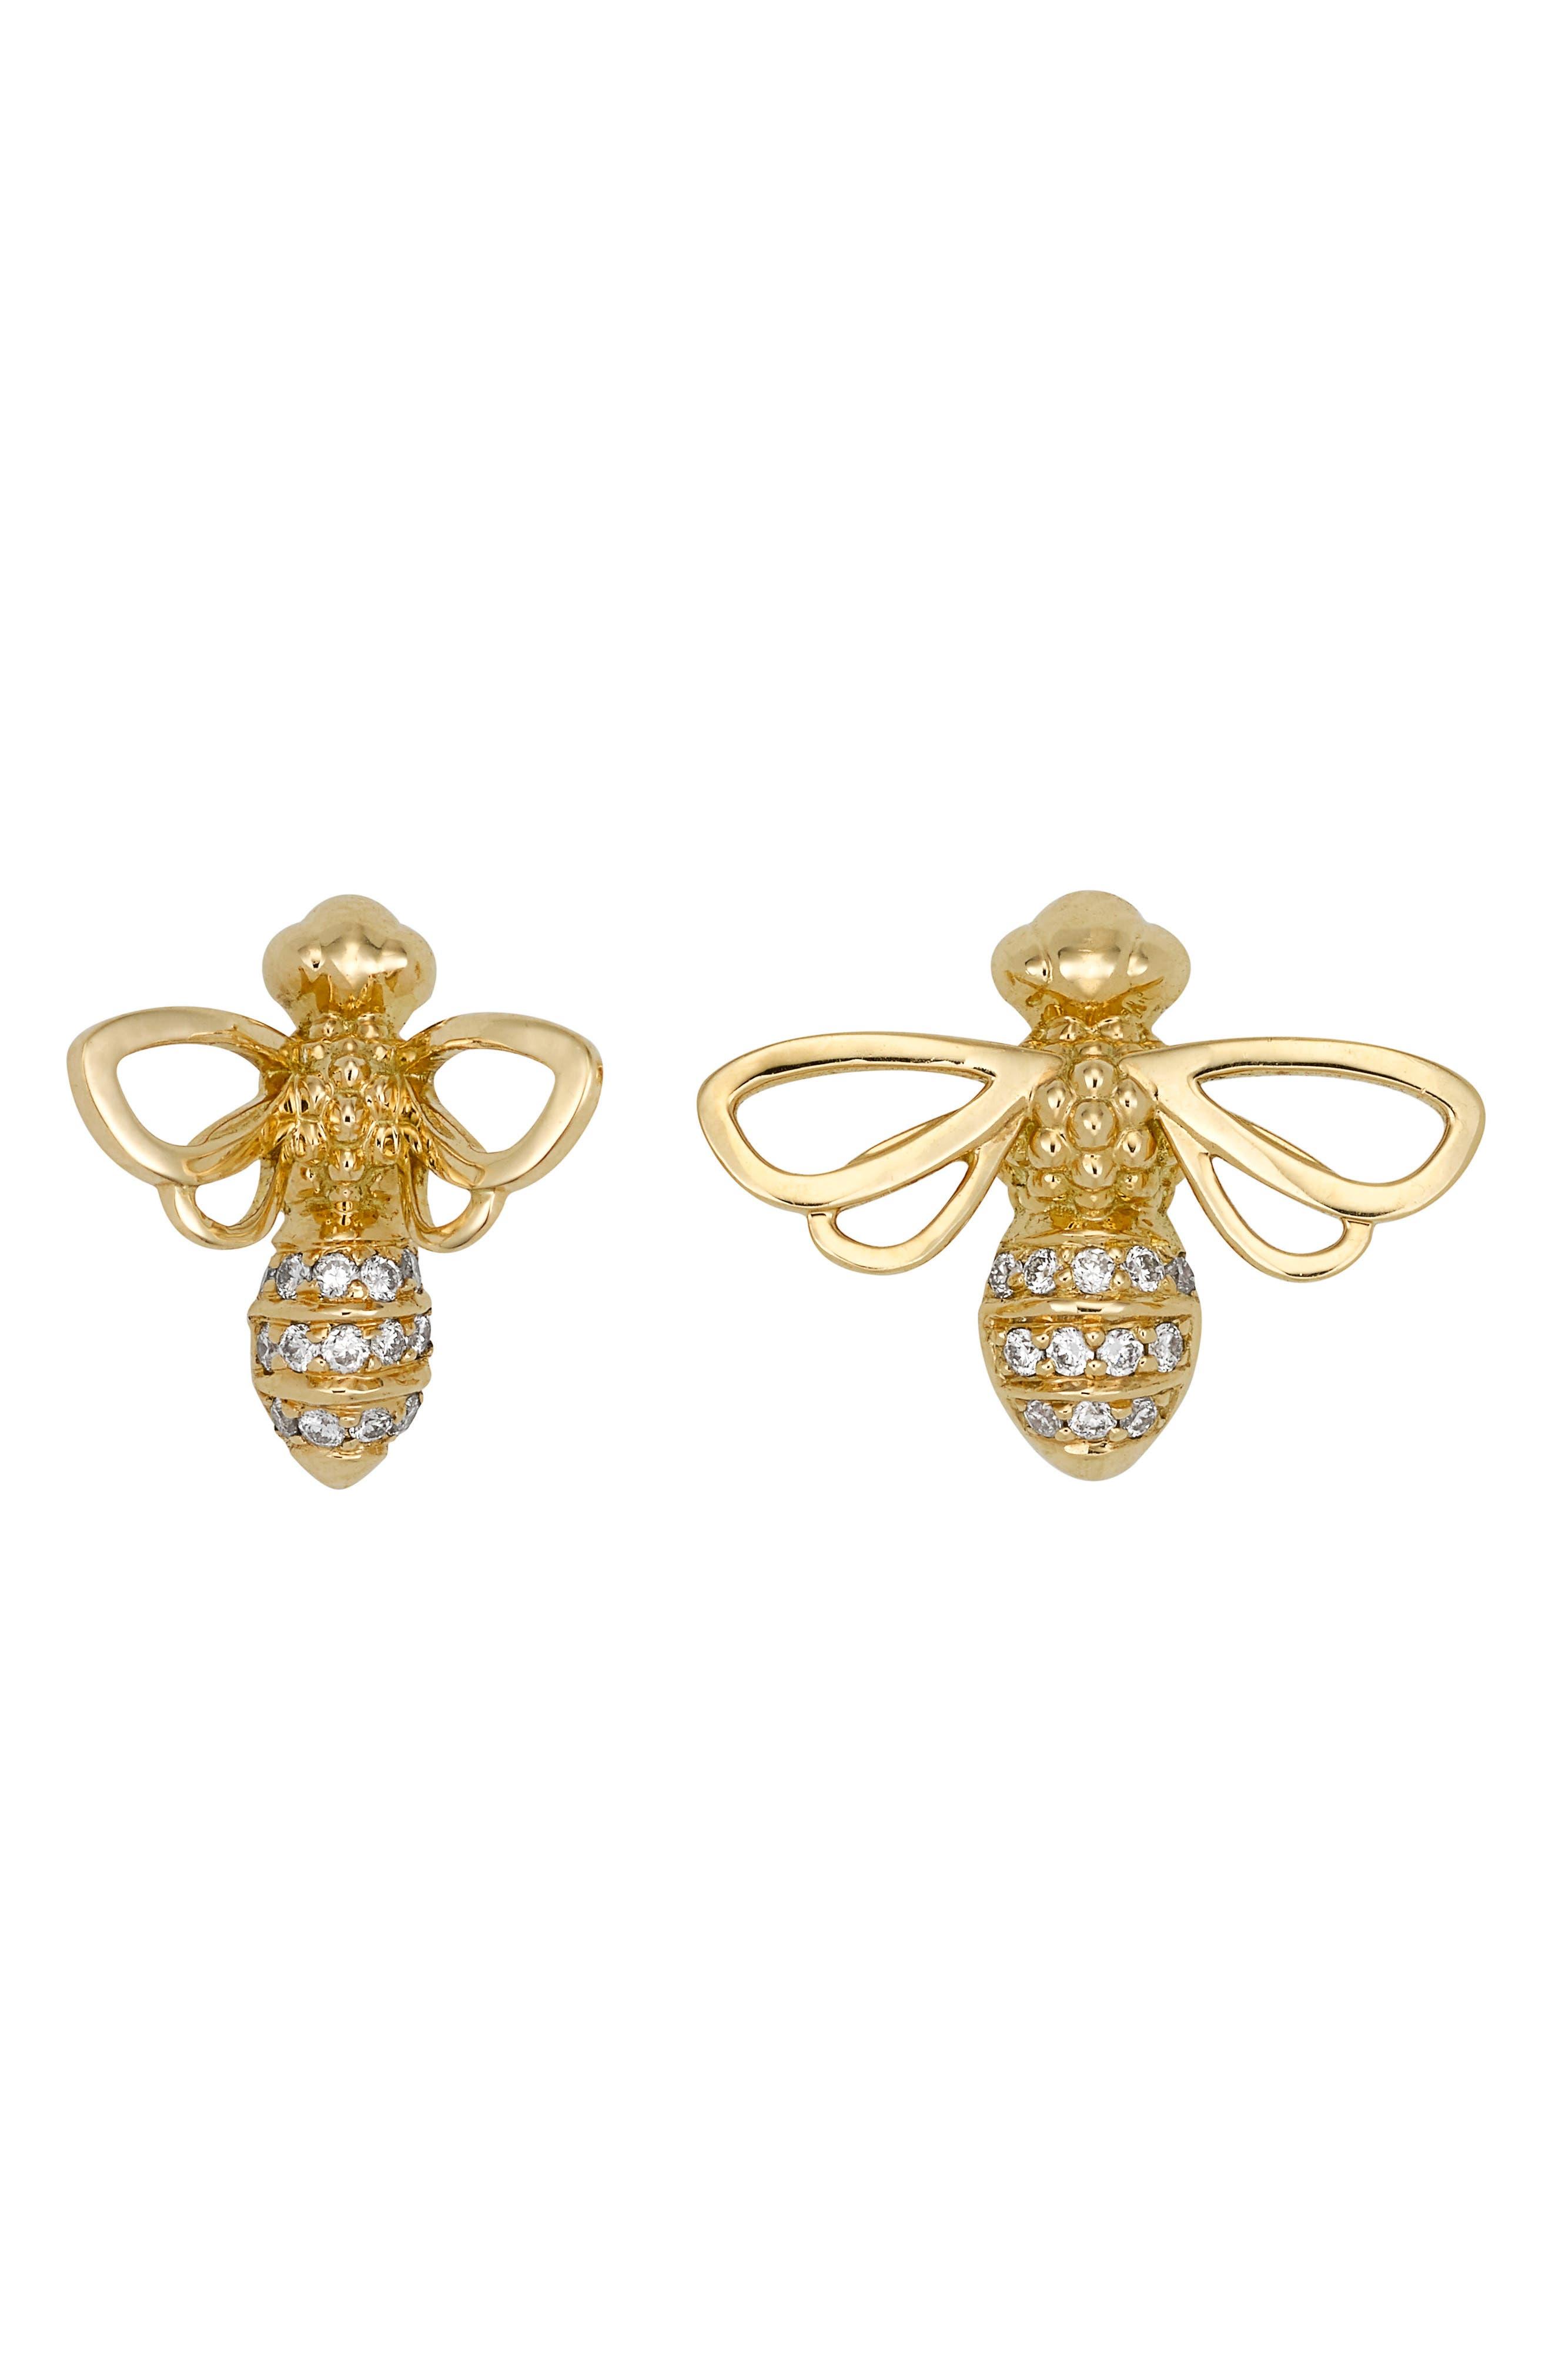 18K Gold & Diamond Bee Stud Earrings,                             Main thumbnail 1, color,                             YELLOW GOLD